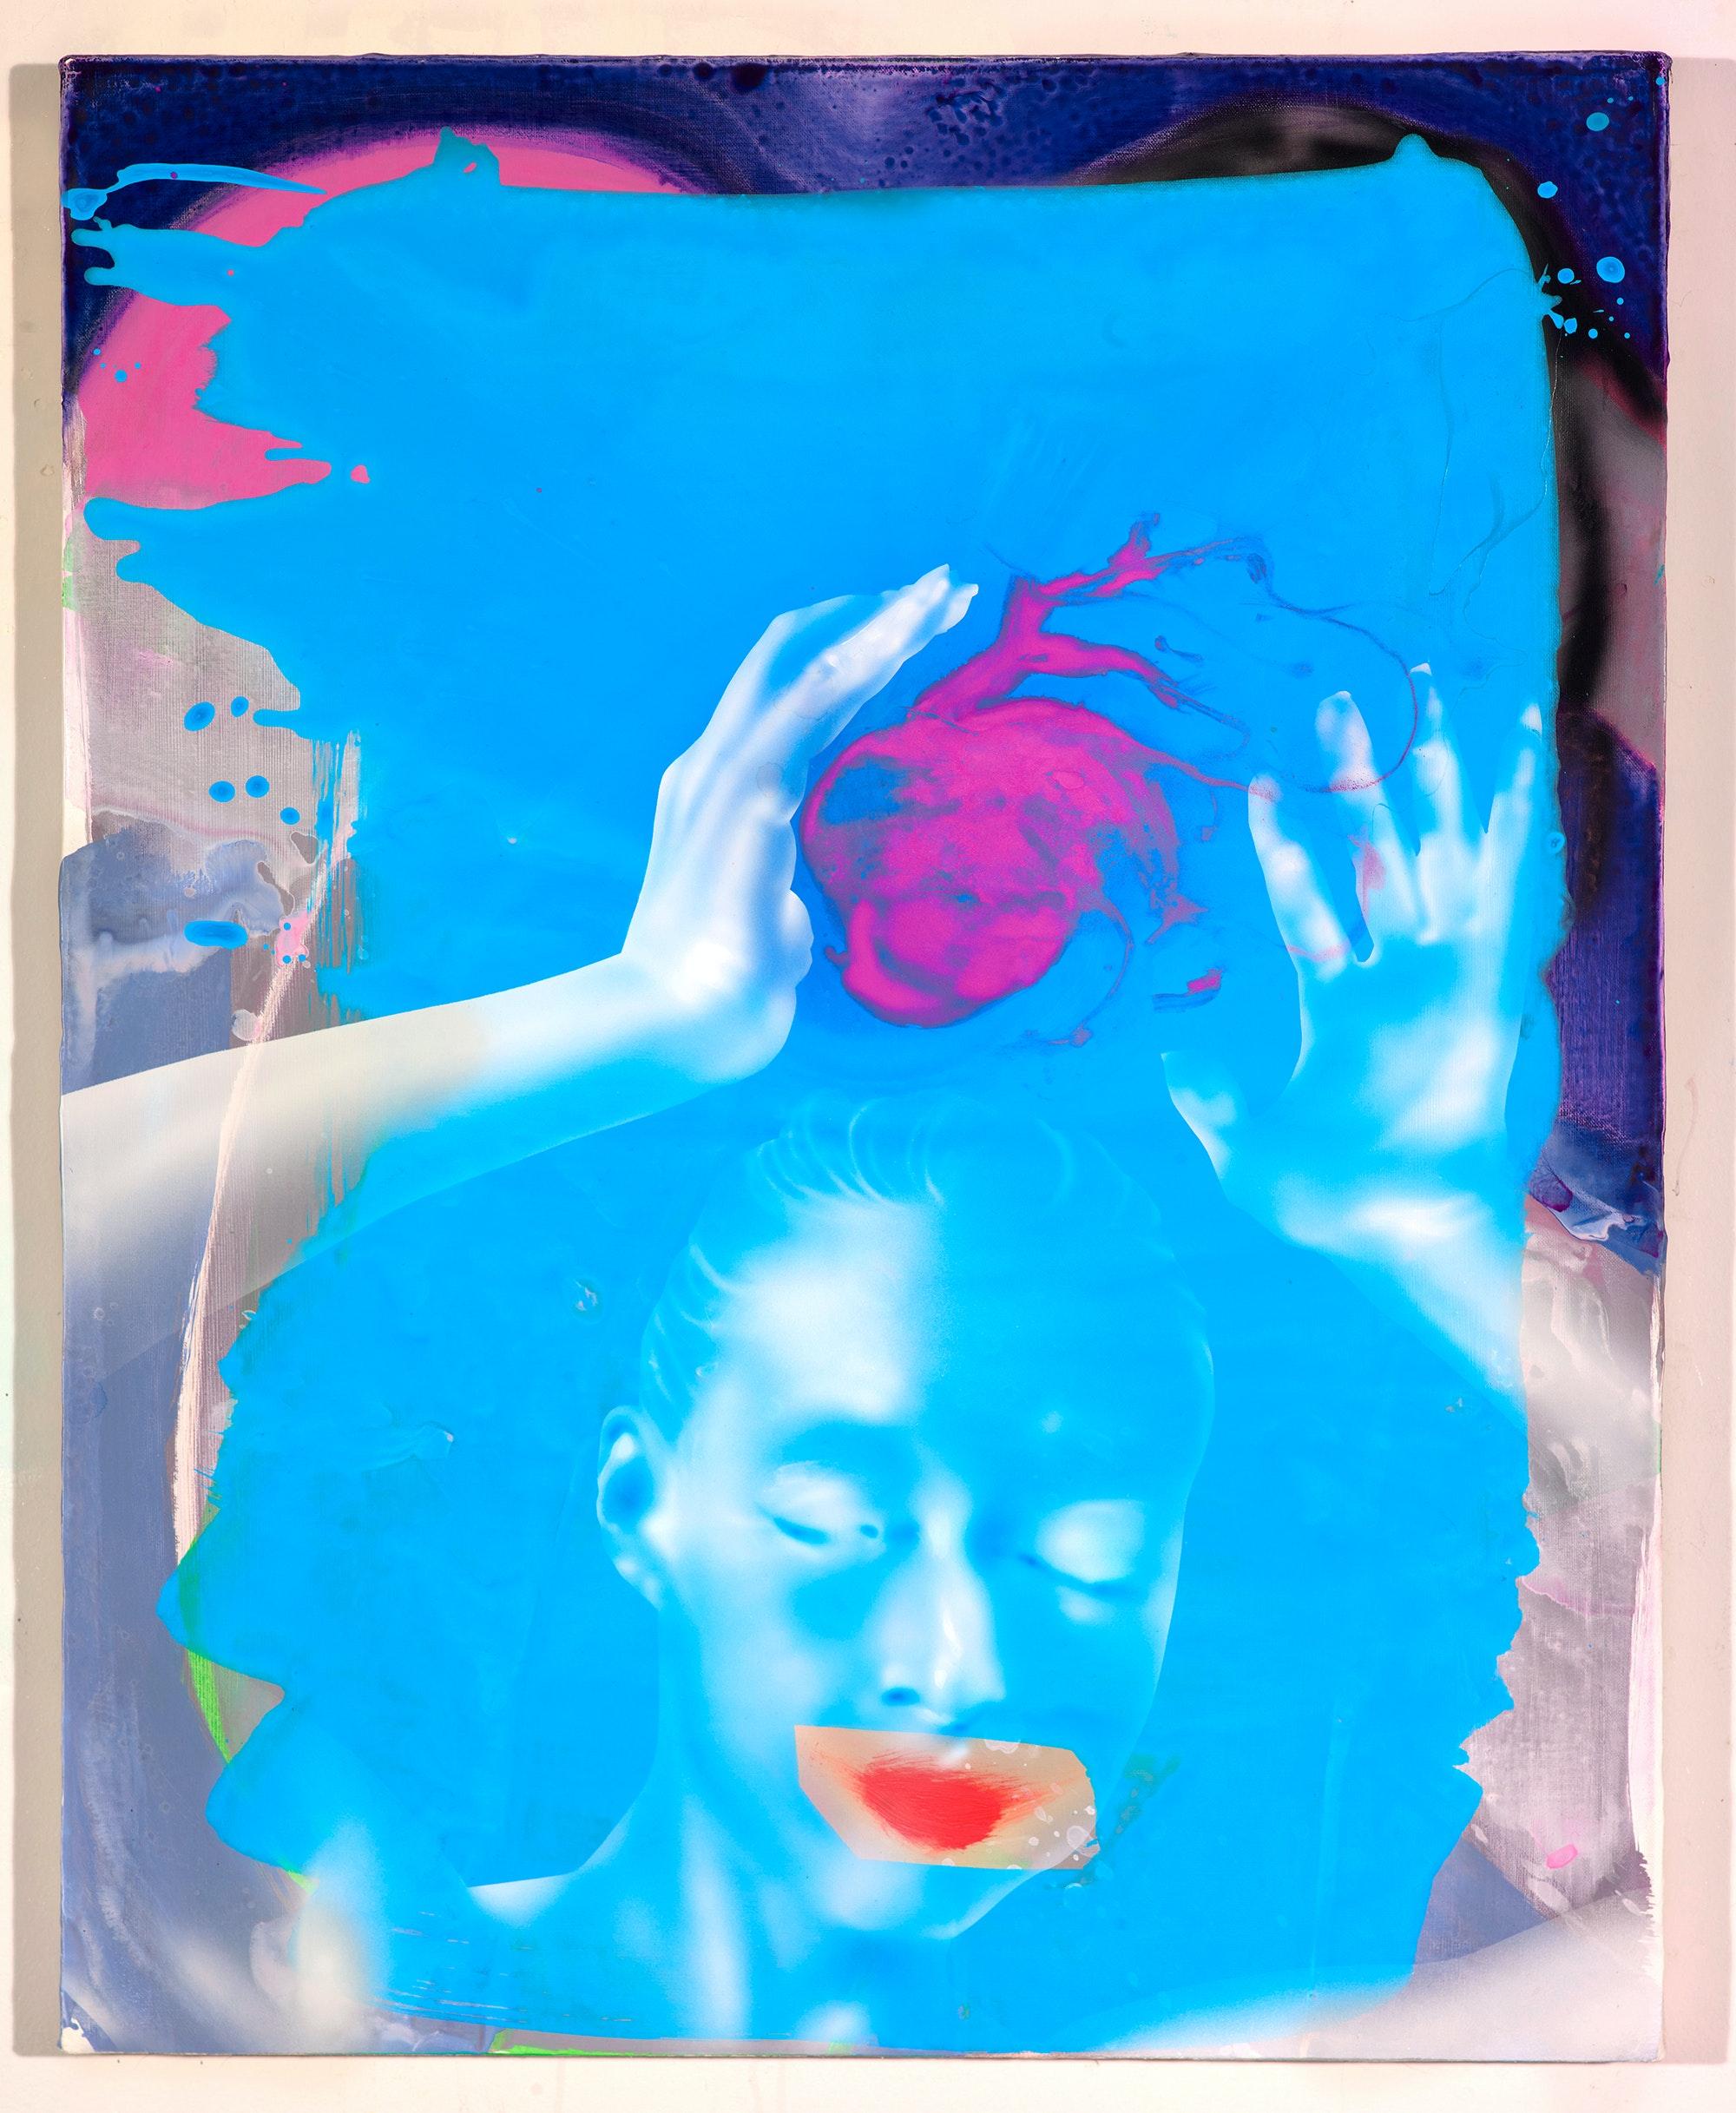 Emilie Stark-Menneg, <em>Heart Wash</em>, 2021. Acrylic and oil on canvas, 30 x 24 inches. Courtesy Steven Harvey Fine Art Projects.